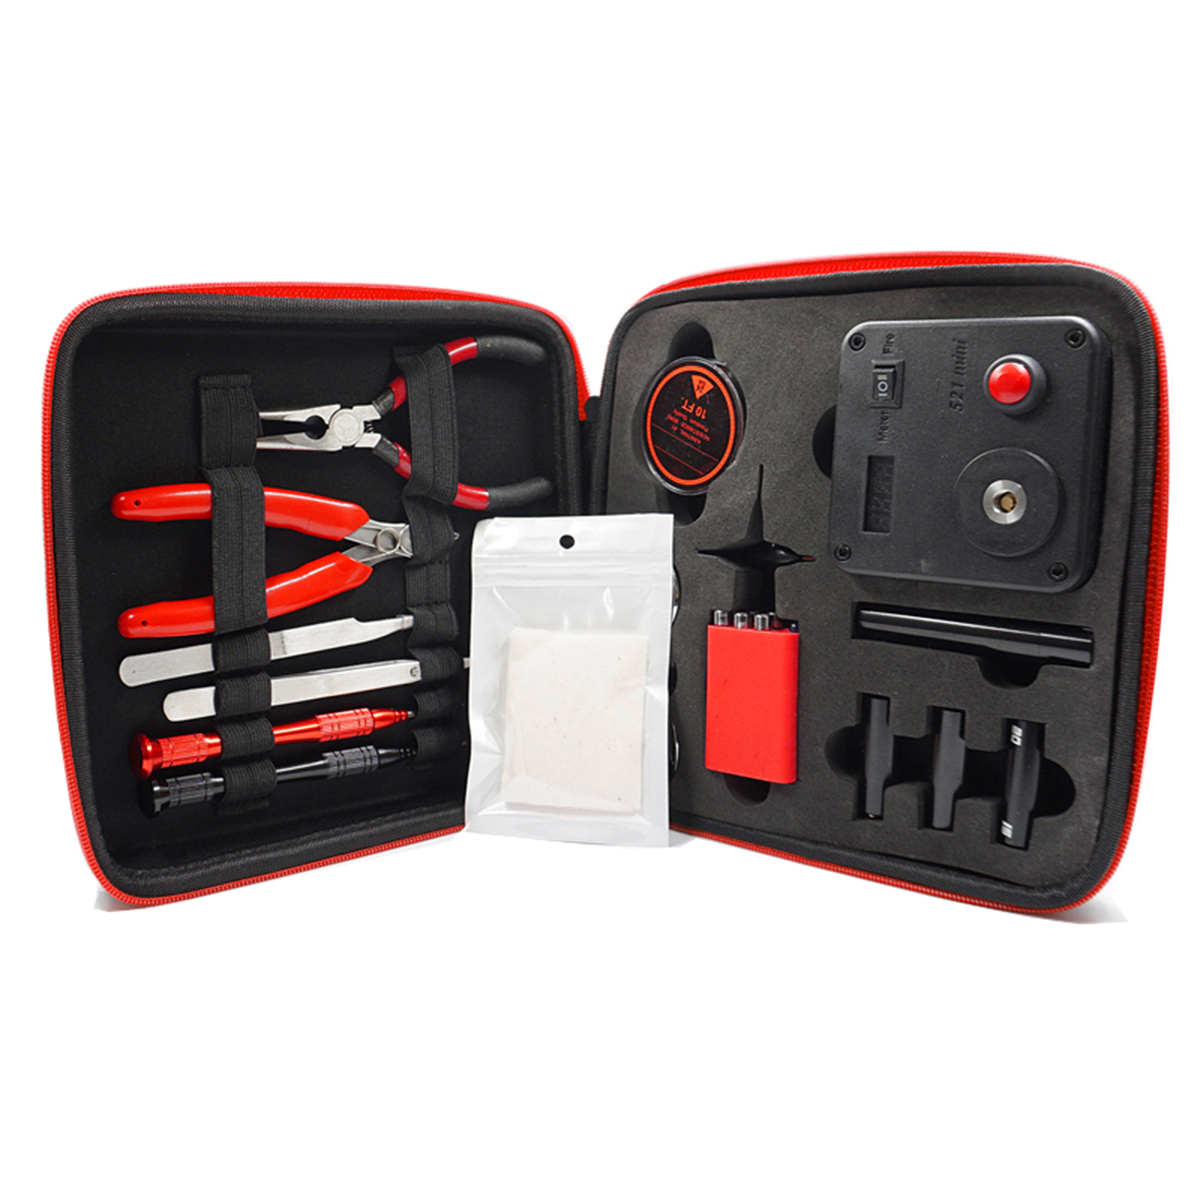 Coil Master V3 VAPE Tool DIY Kit Accessories Combo SetCoil Master V3 VAPE Tool DIY Kit Accessories Combo Set